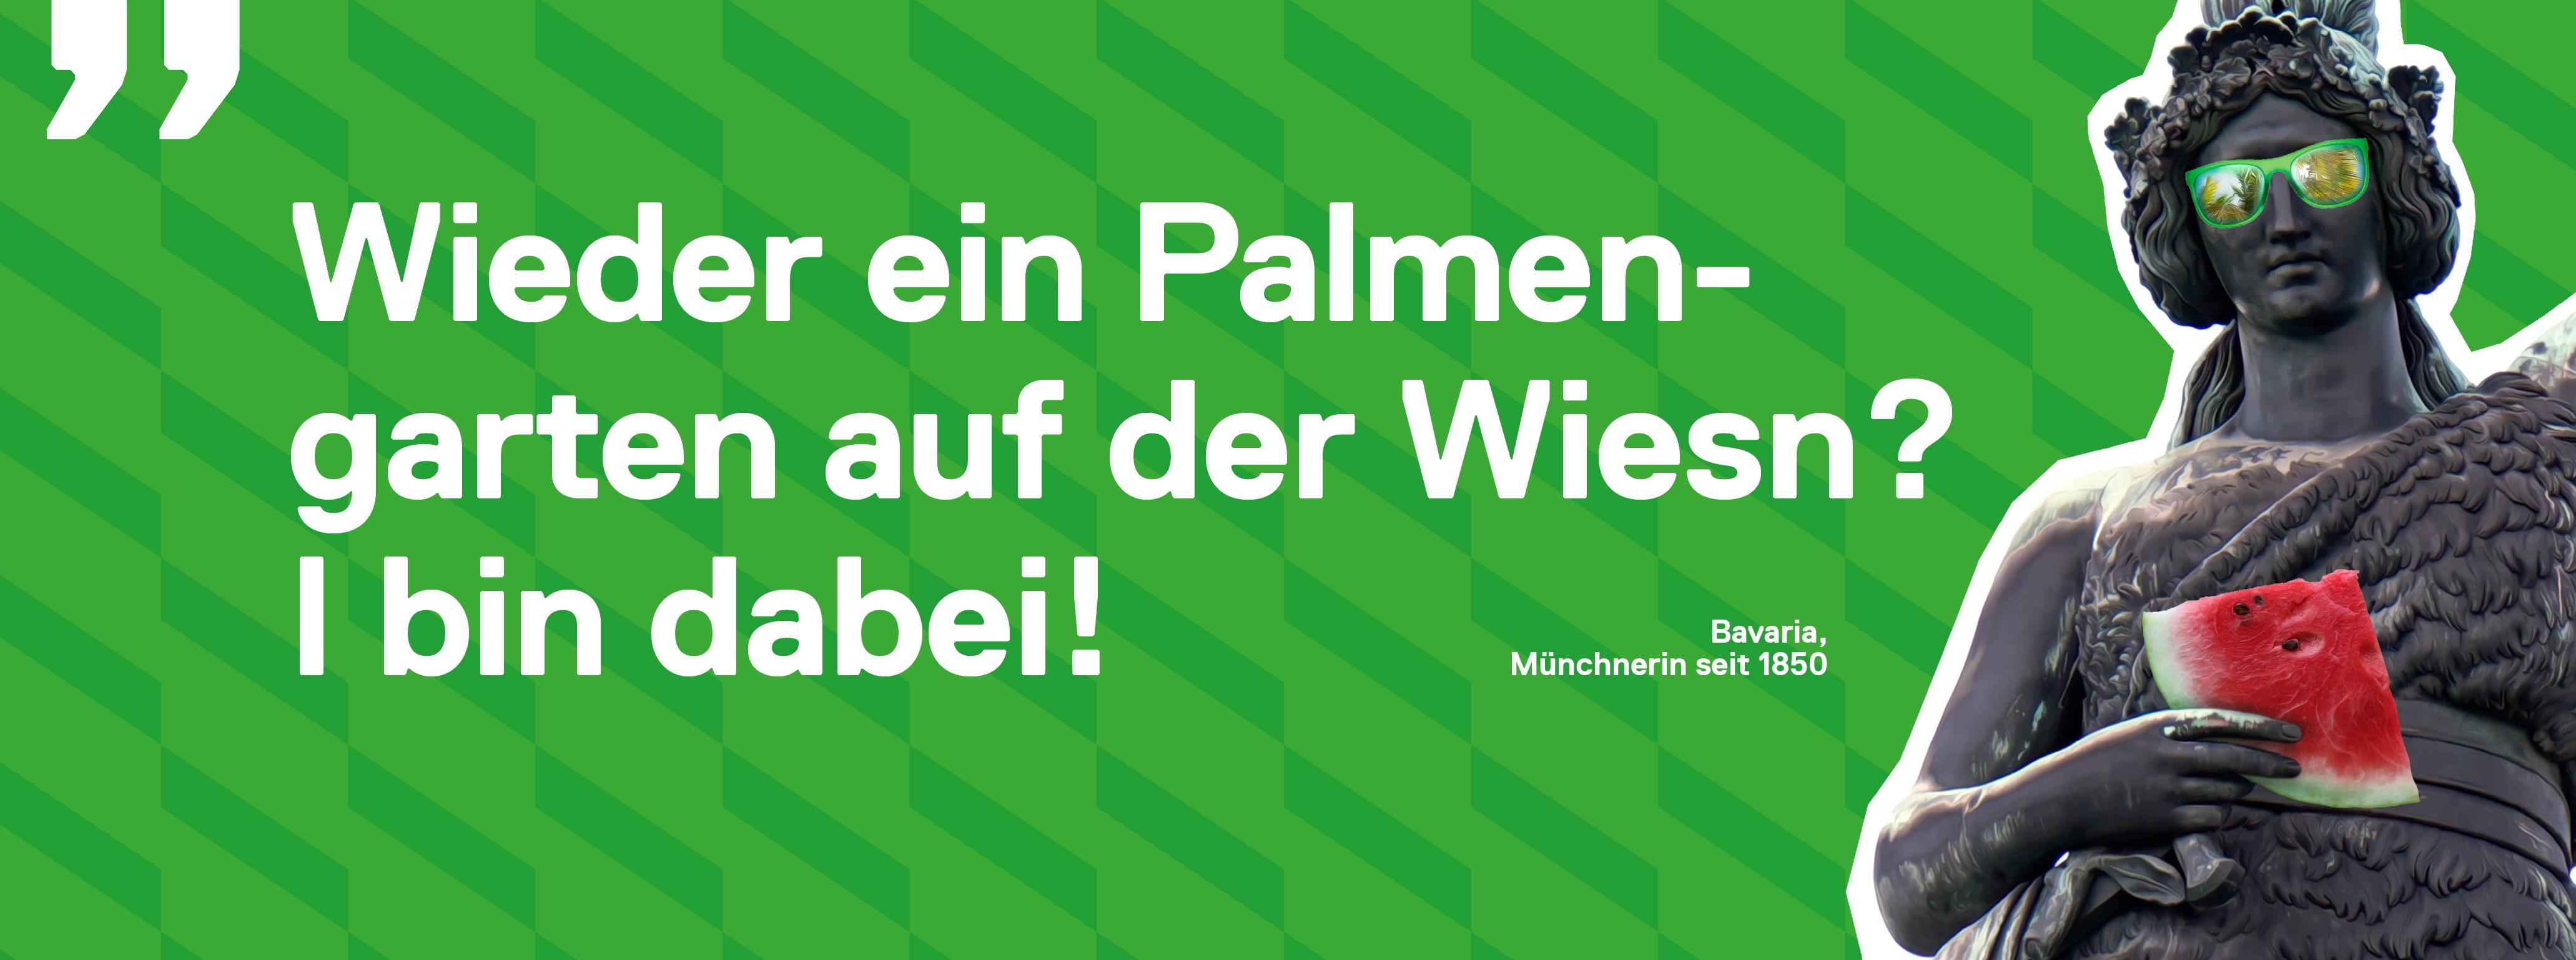 Palmengarten2021